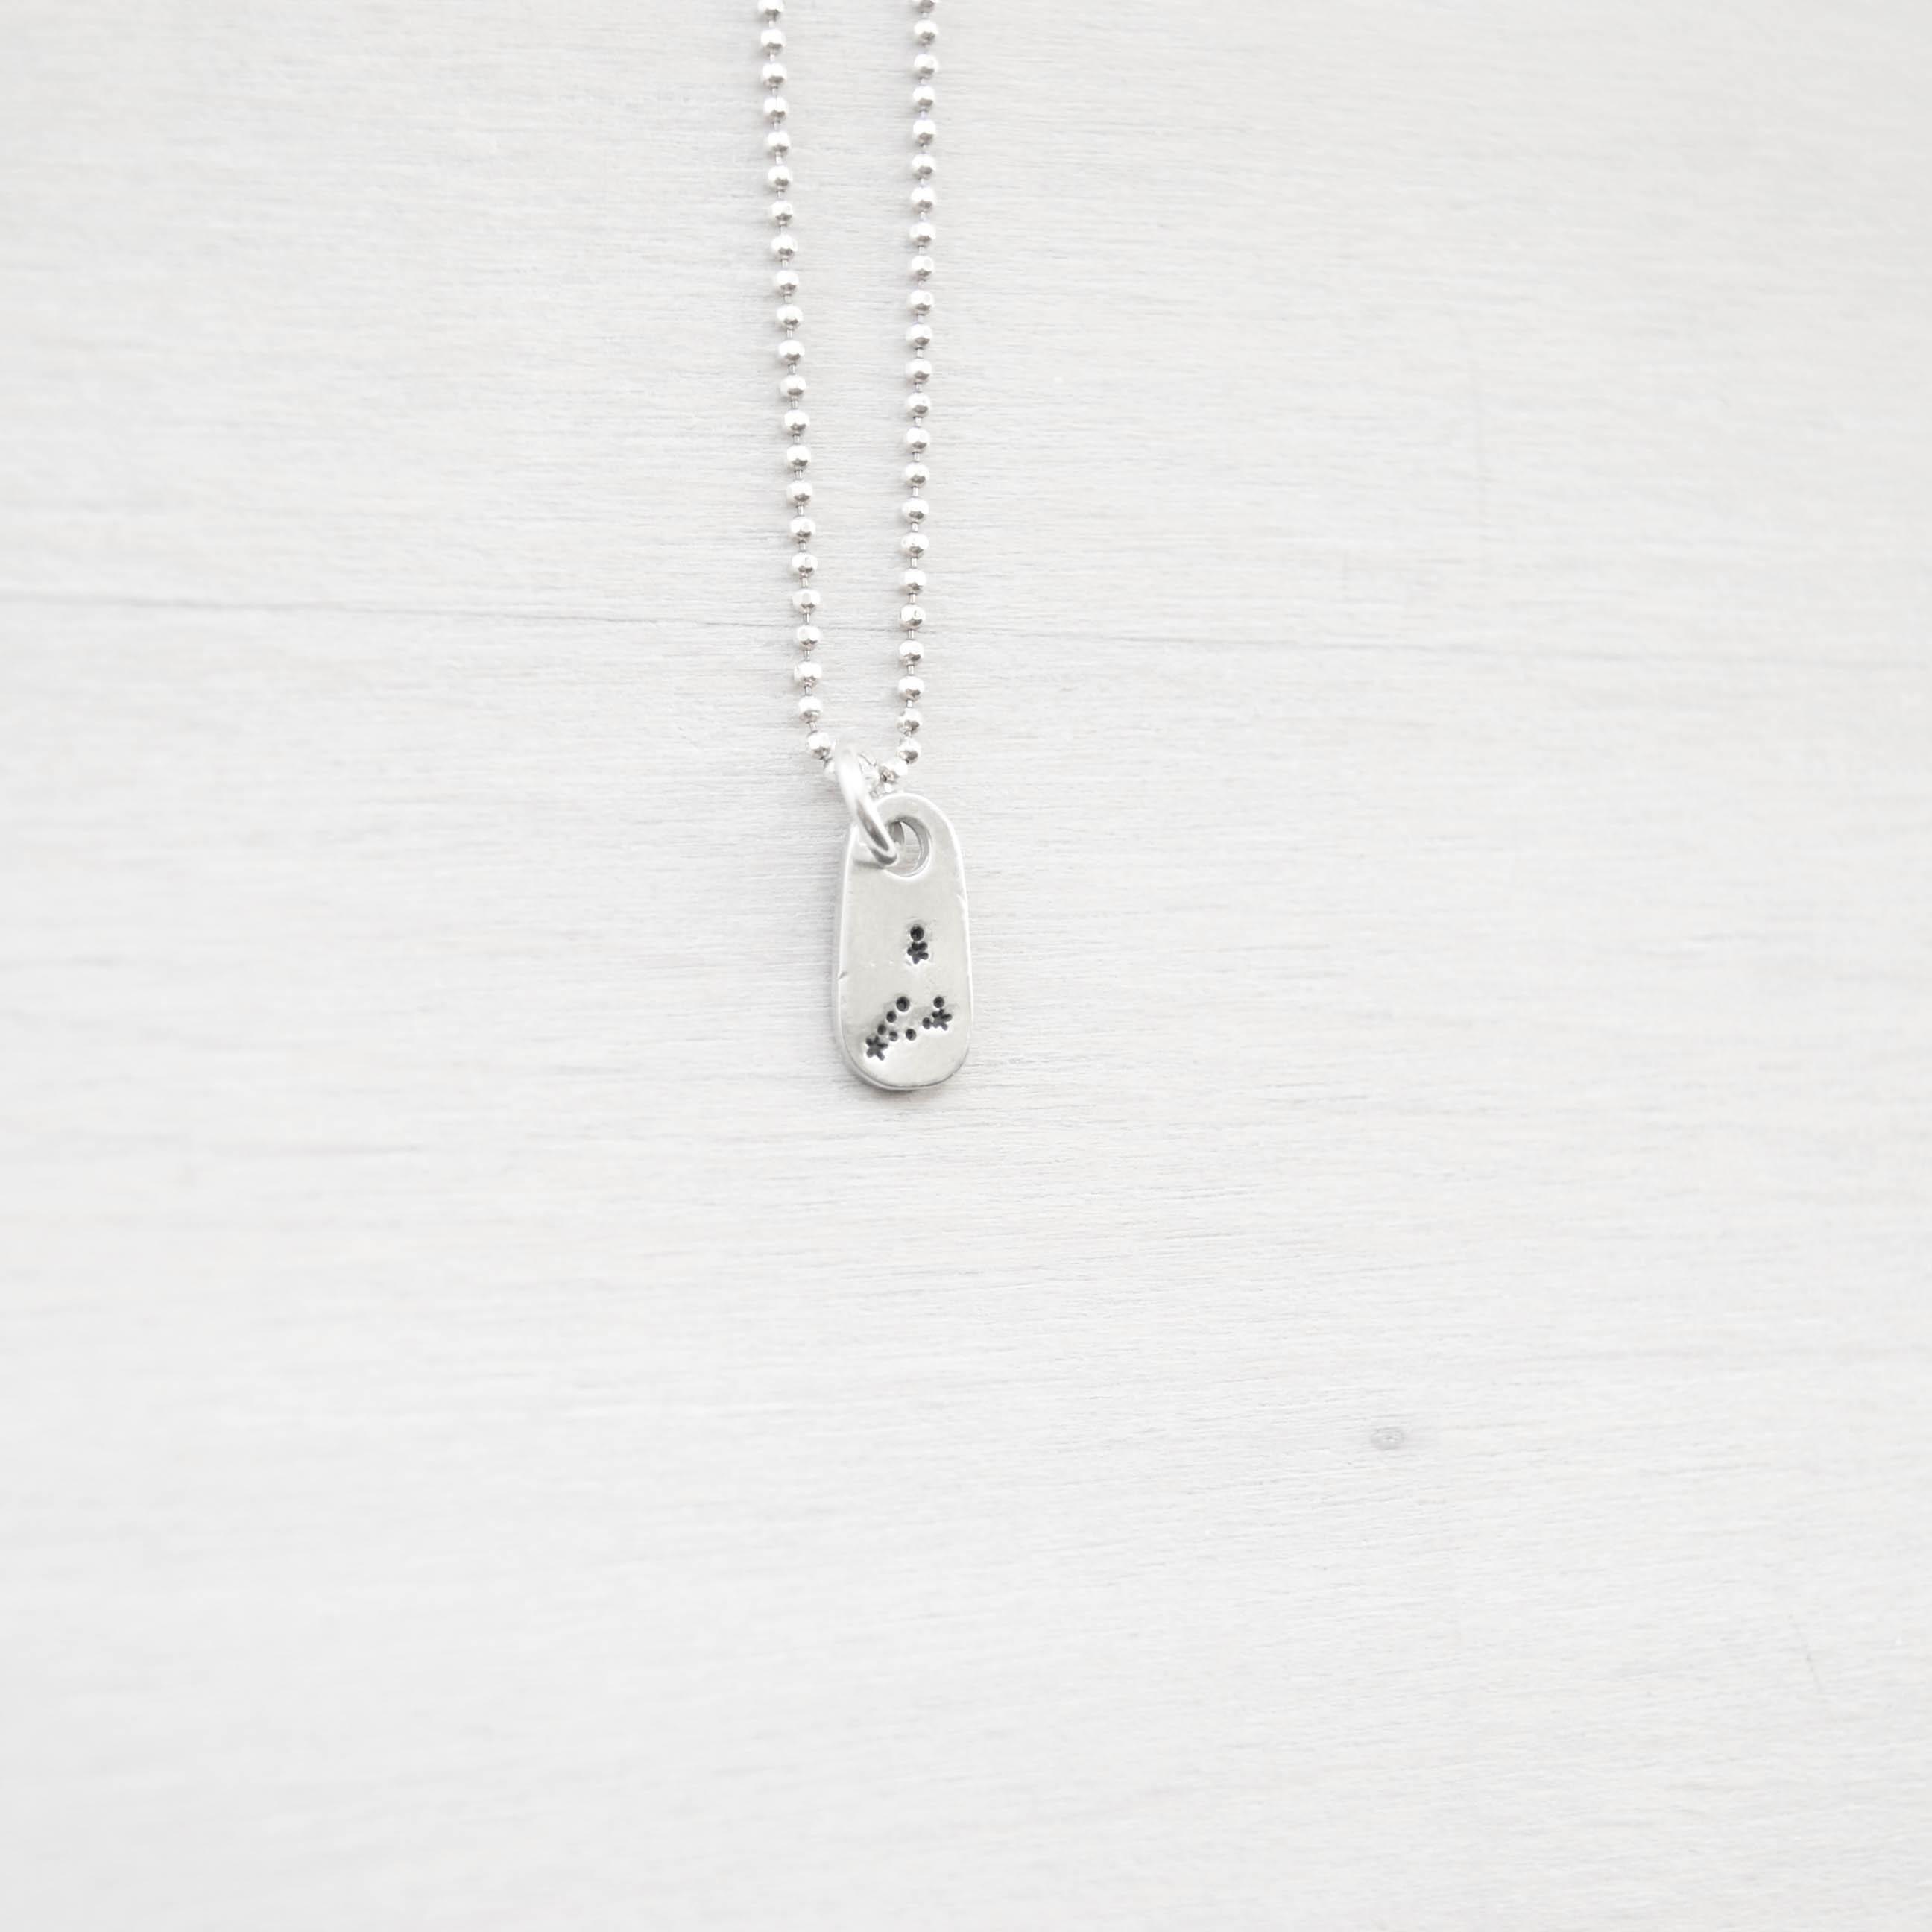 Capricorn Constellation Zodiac Necklace in Artisan Pewter